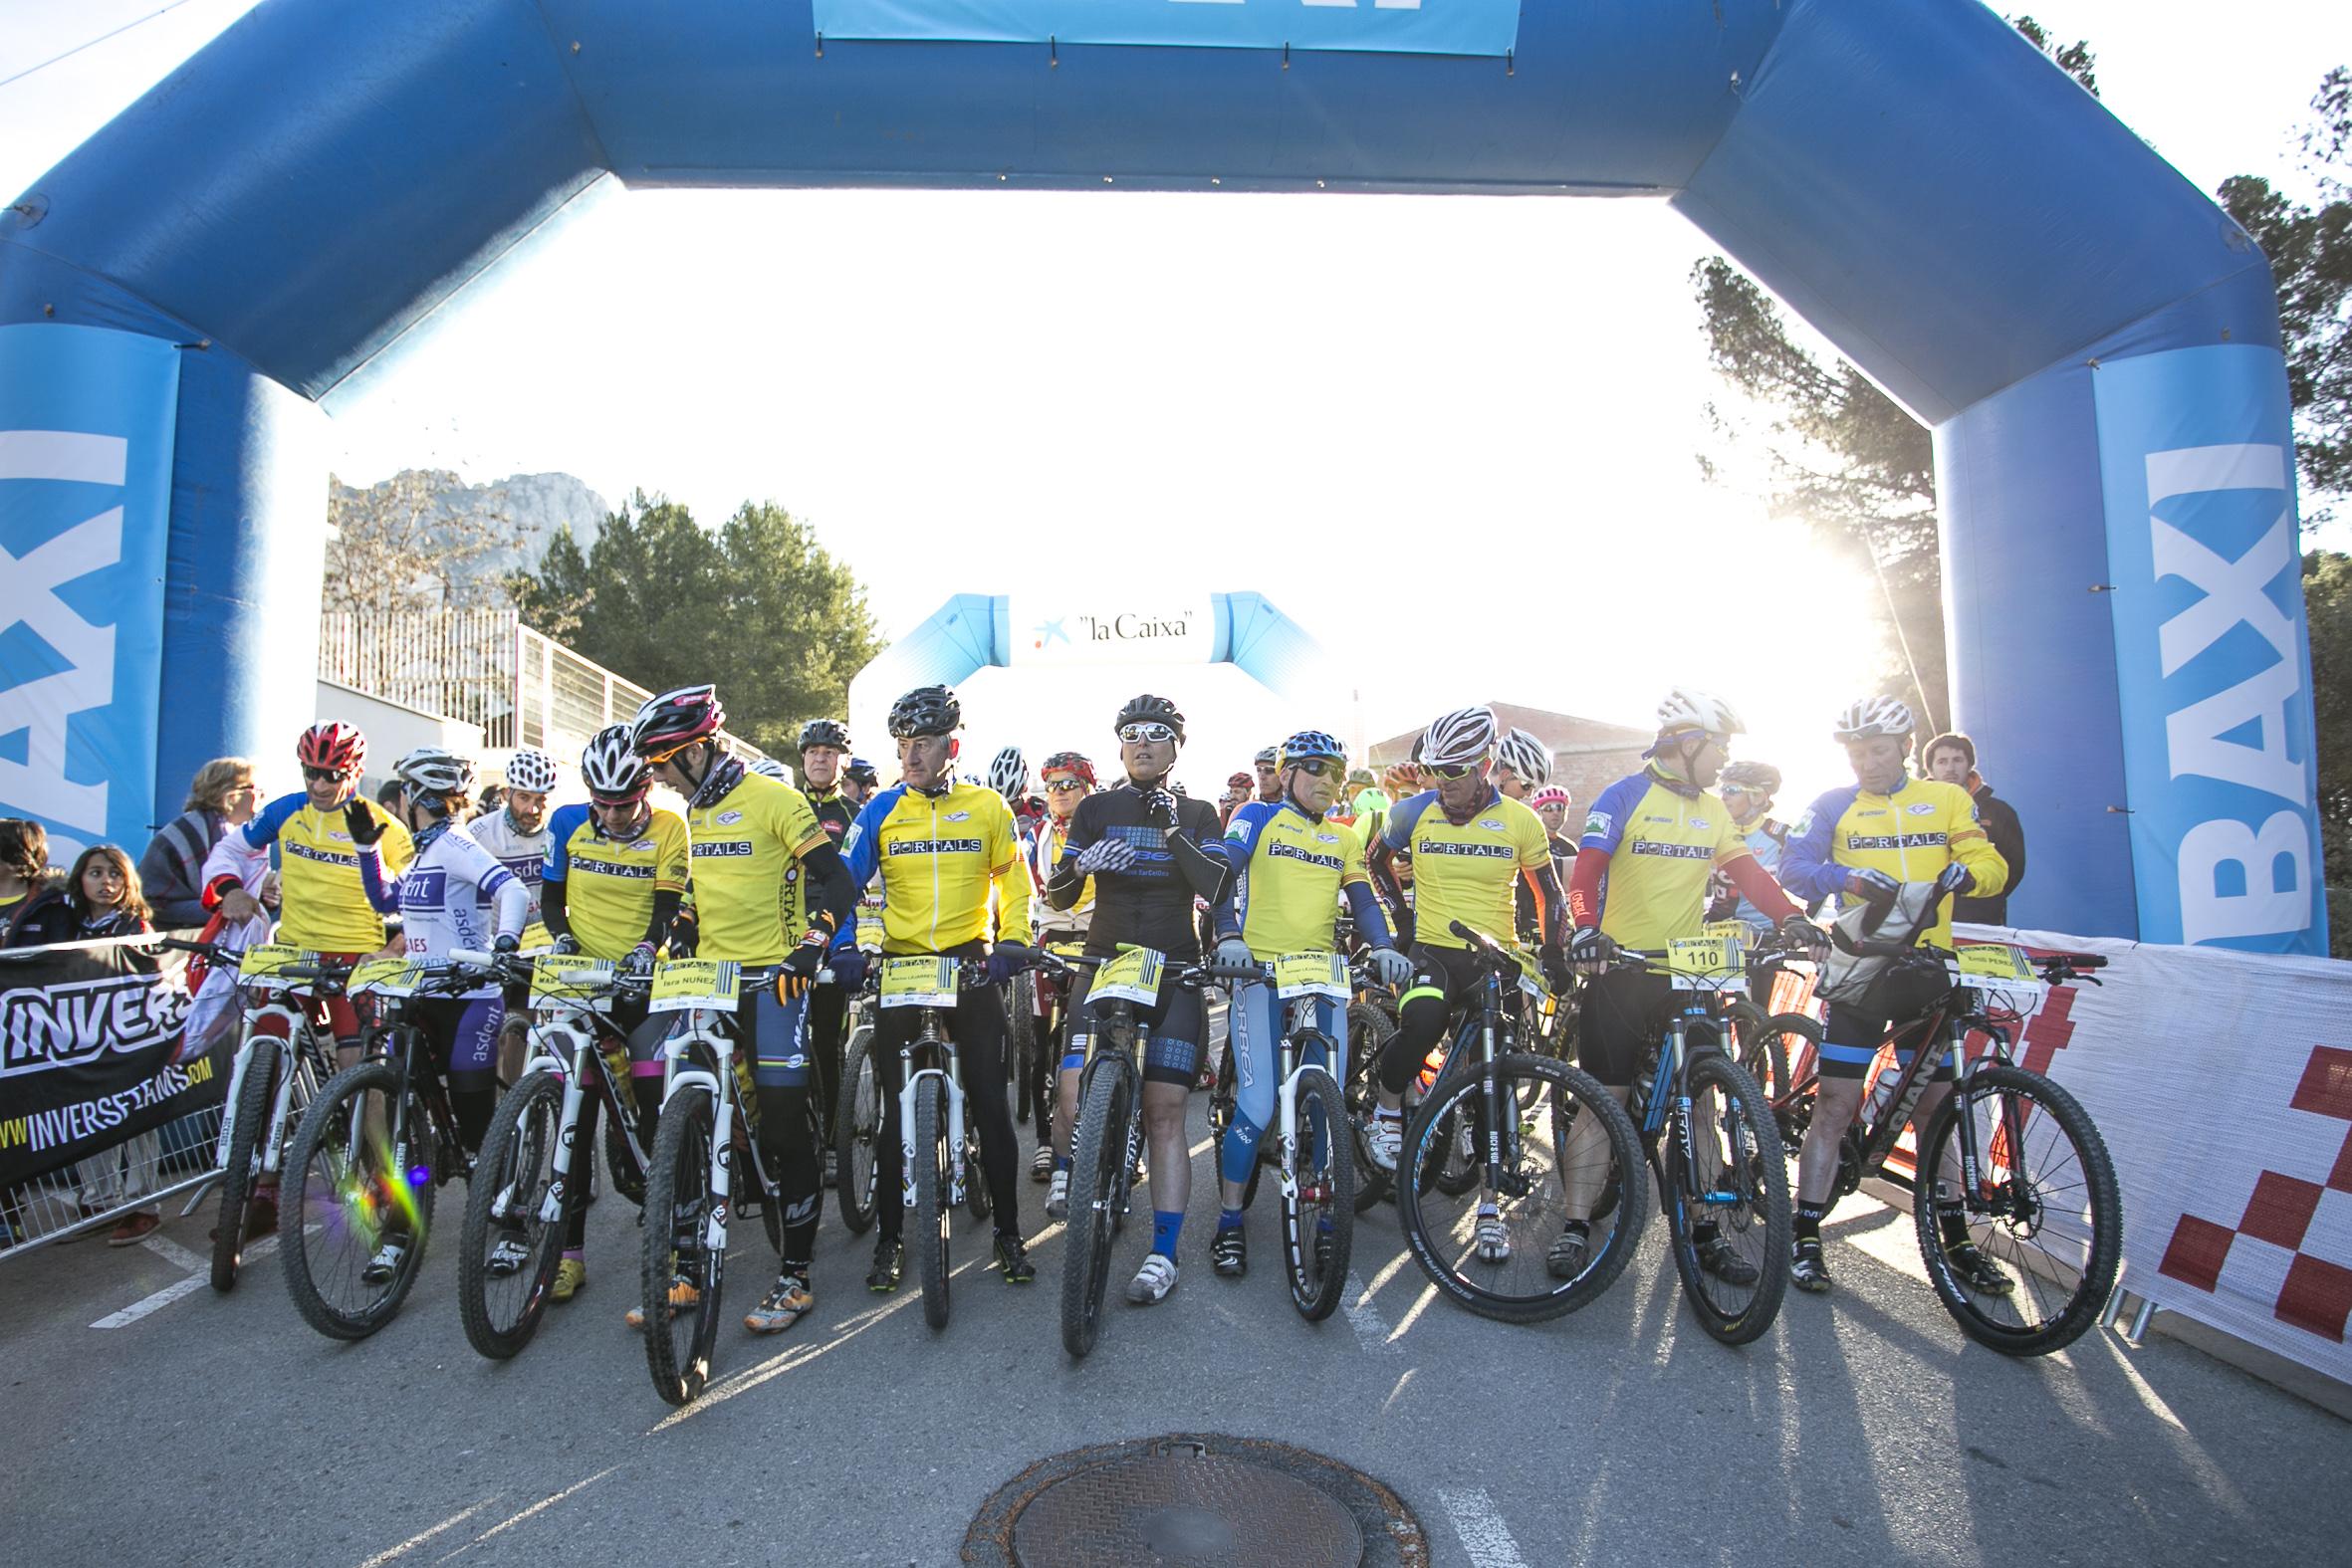 La Portals reúne a 1500 ciclistas en el macizo de Montserrat